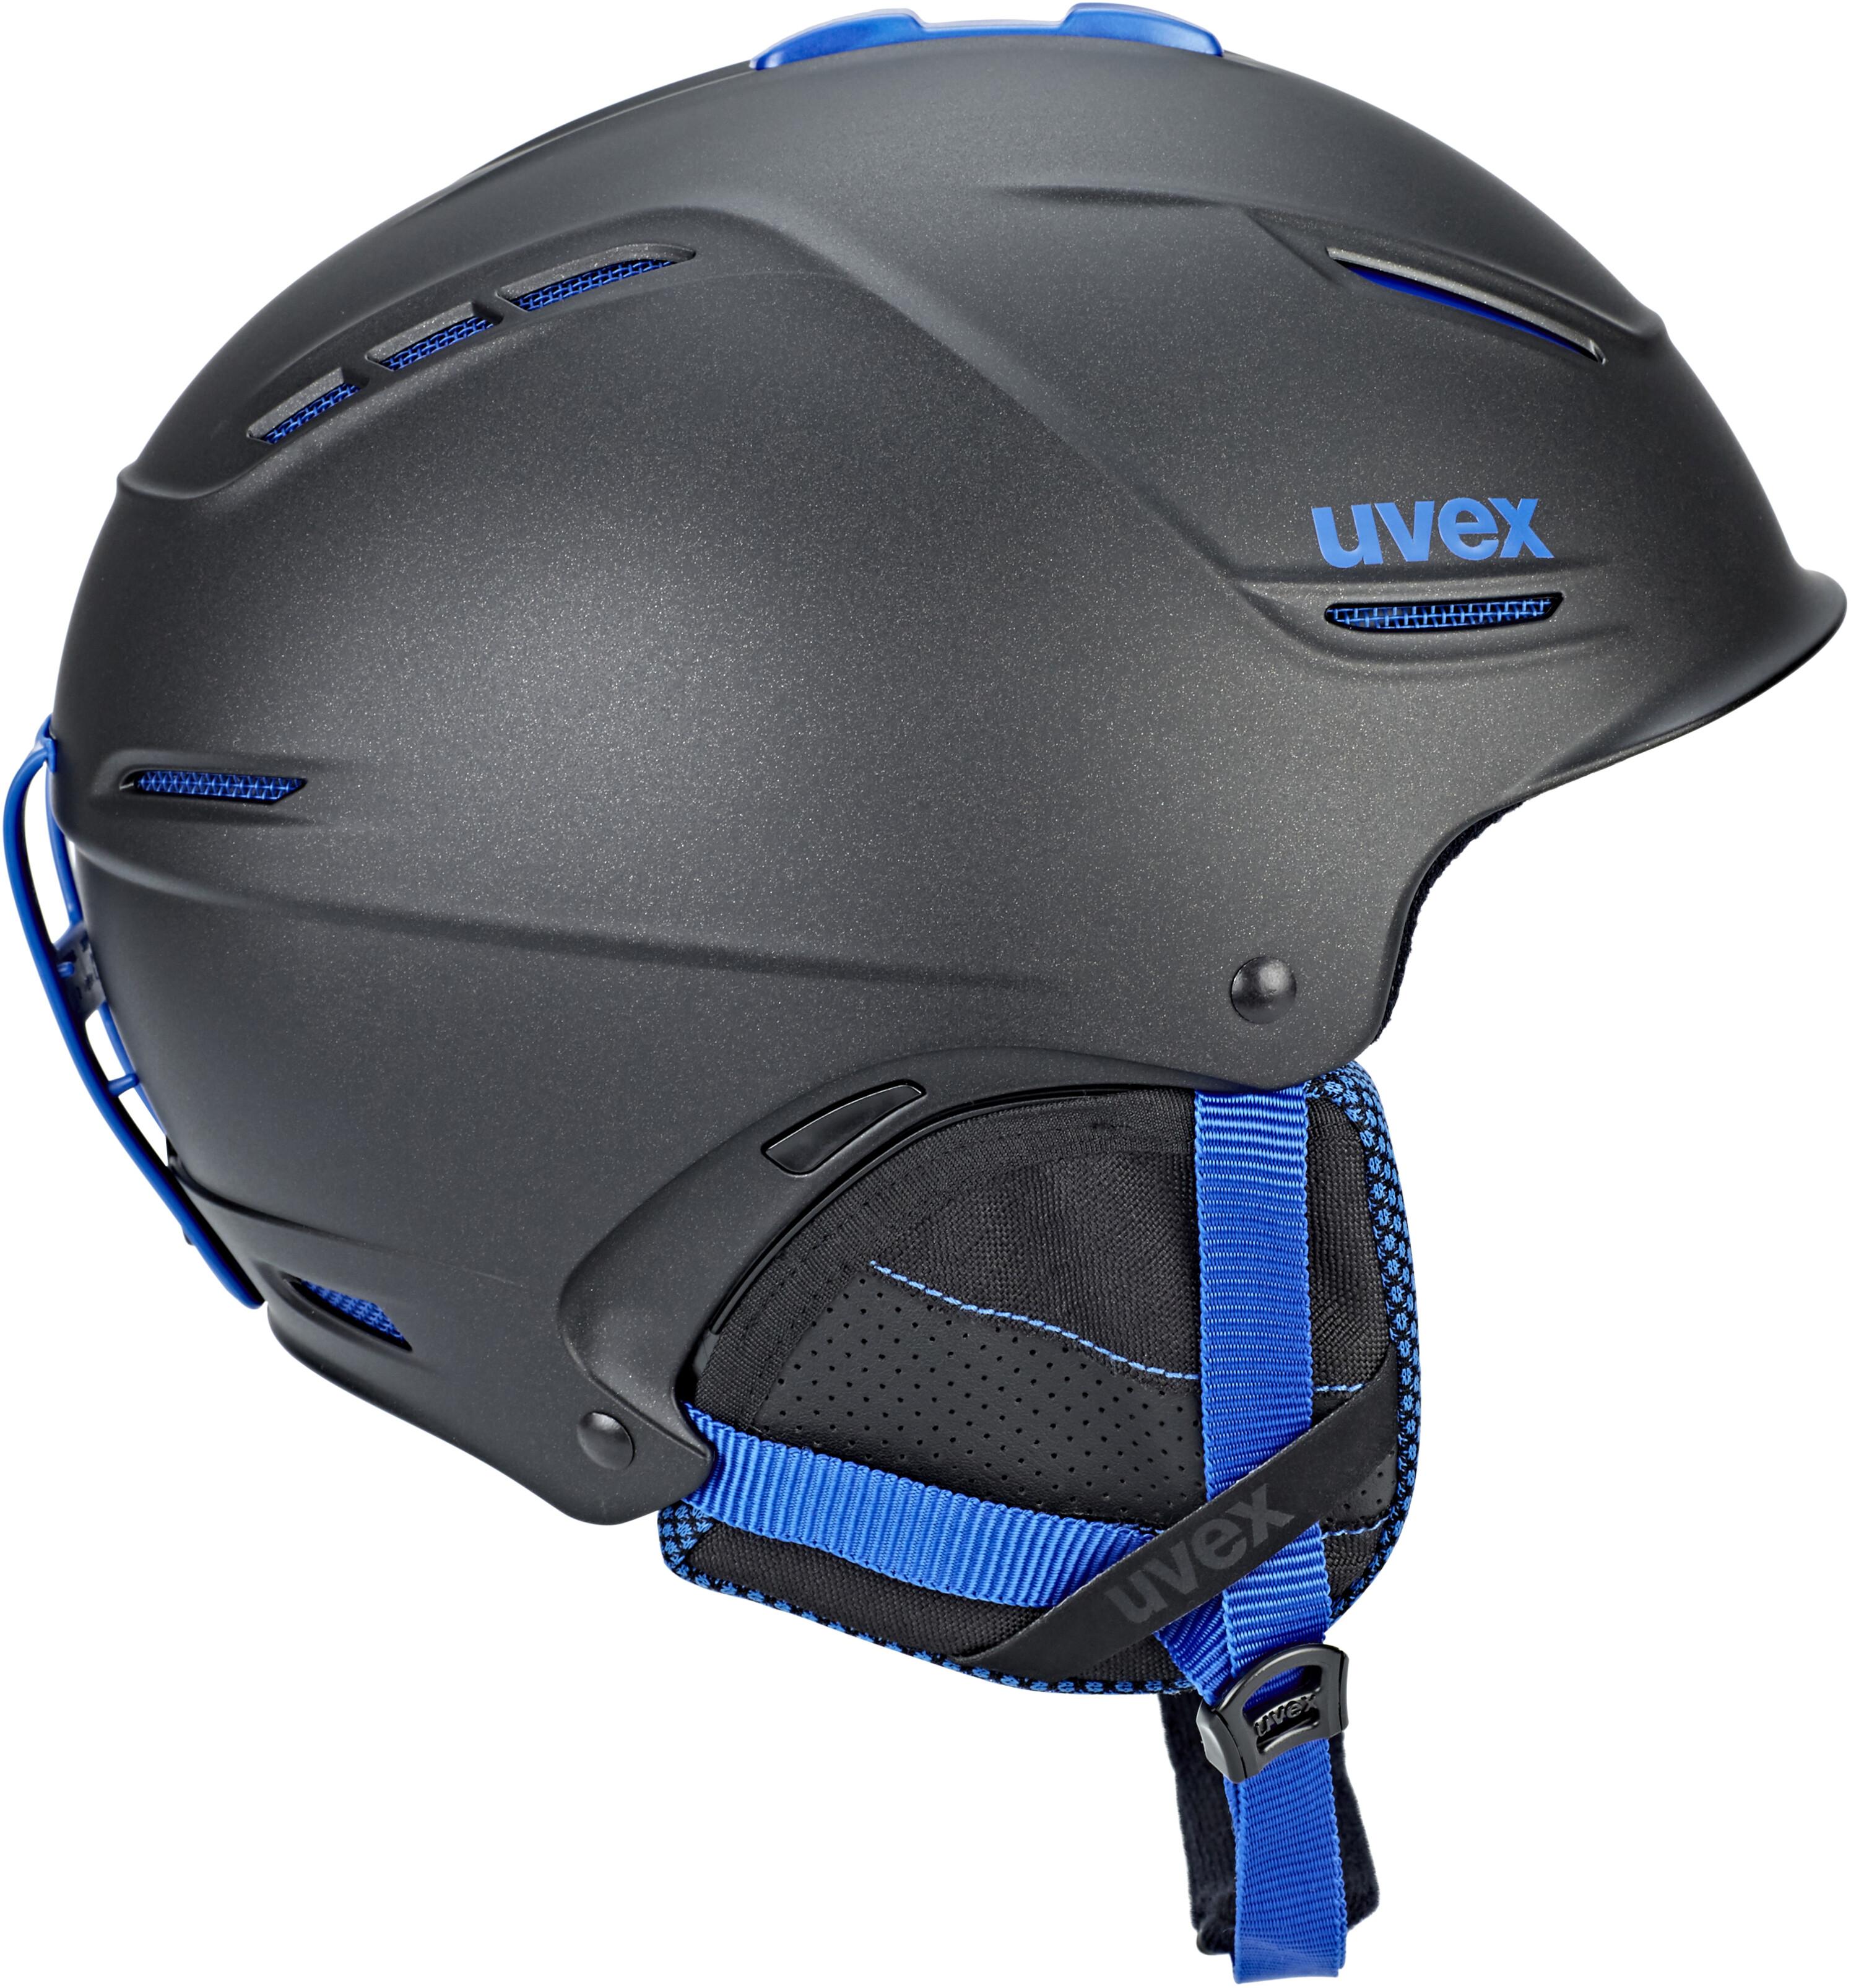 UVEX p1us Pro Helmet blue at Addnature.co.uk c2bca4706